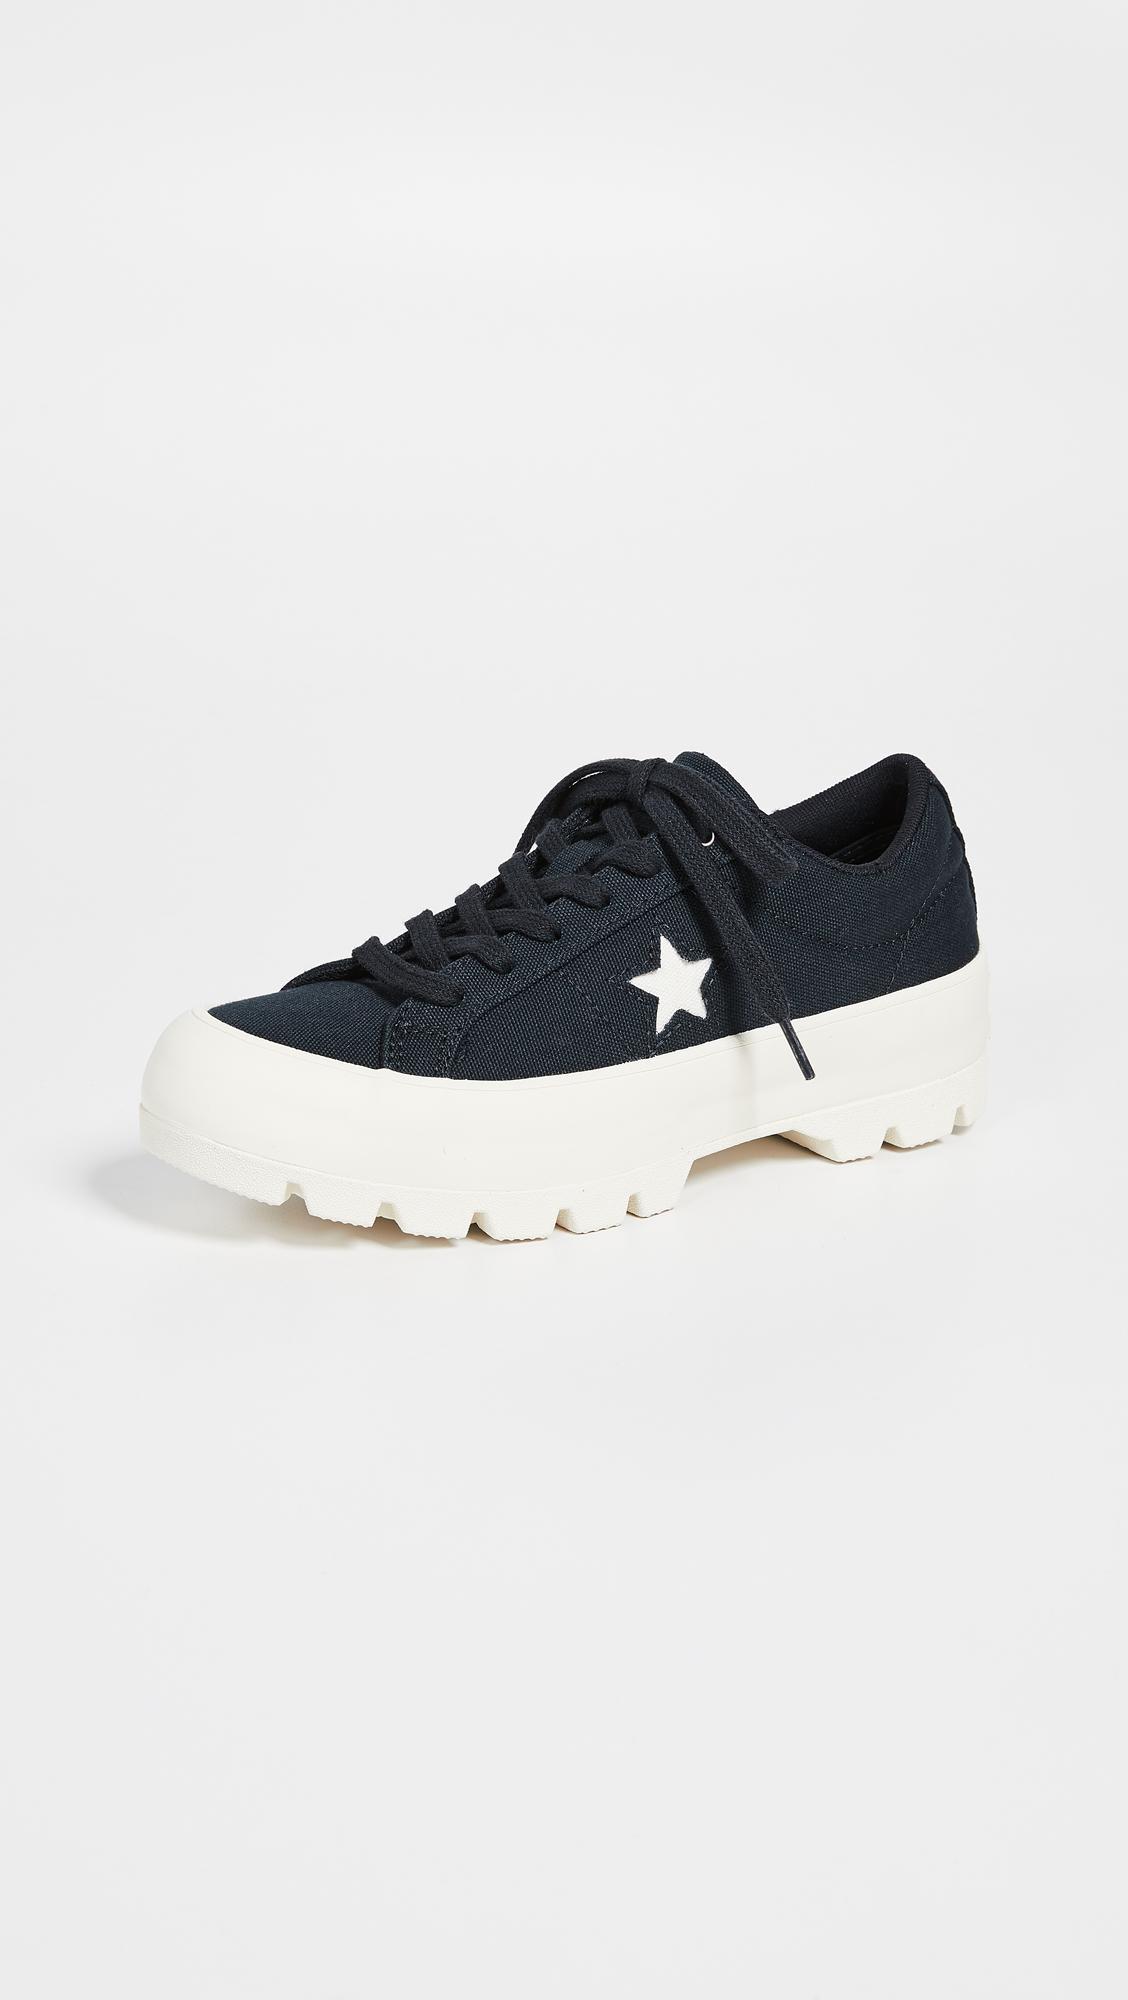 e8ba0b5ecc9721 ... One Star Lugged Ox Sneakers - Lyst. View fullscreen